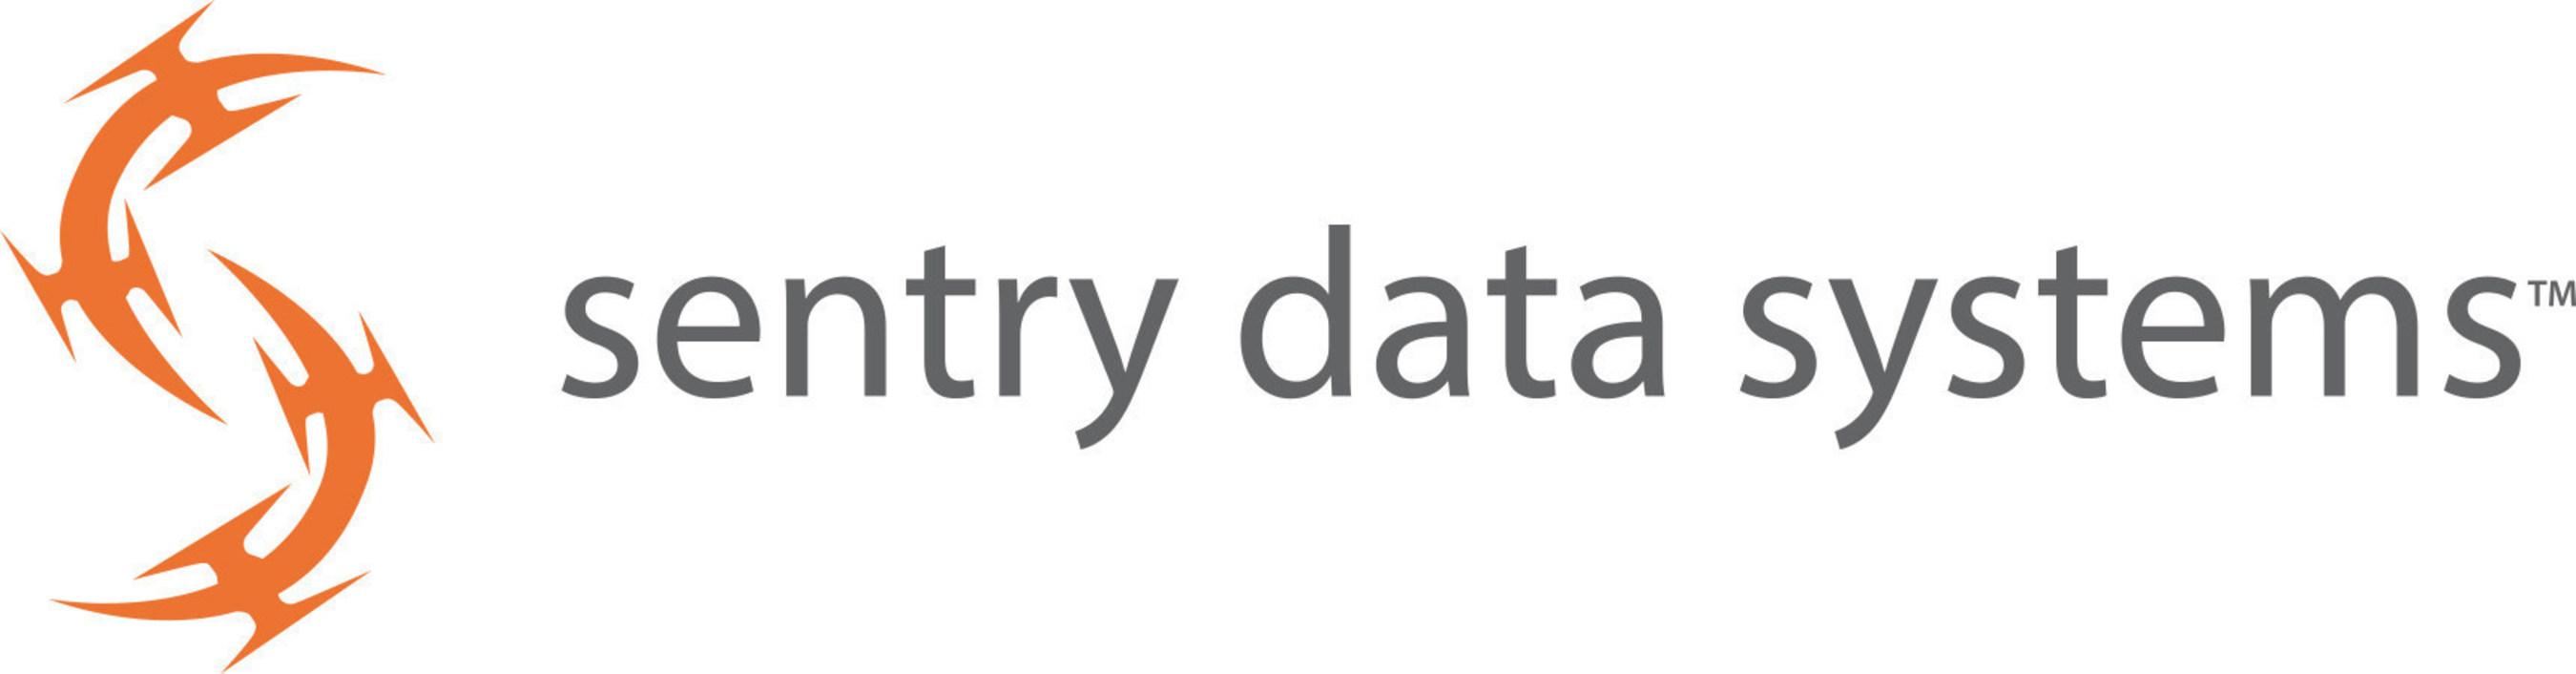 Lisa Scholz joins Sentry Data Systems' executive team